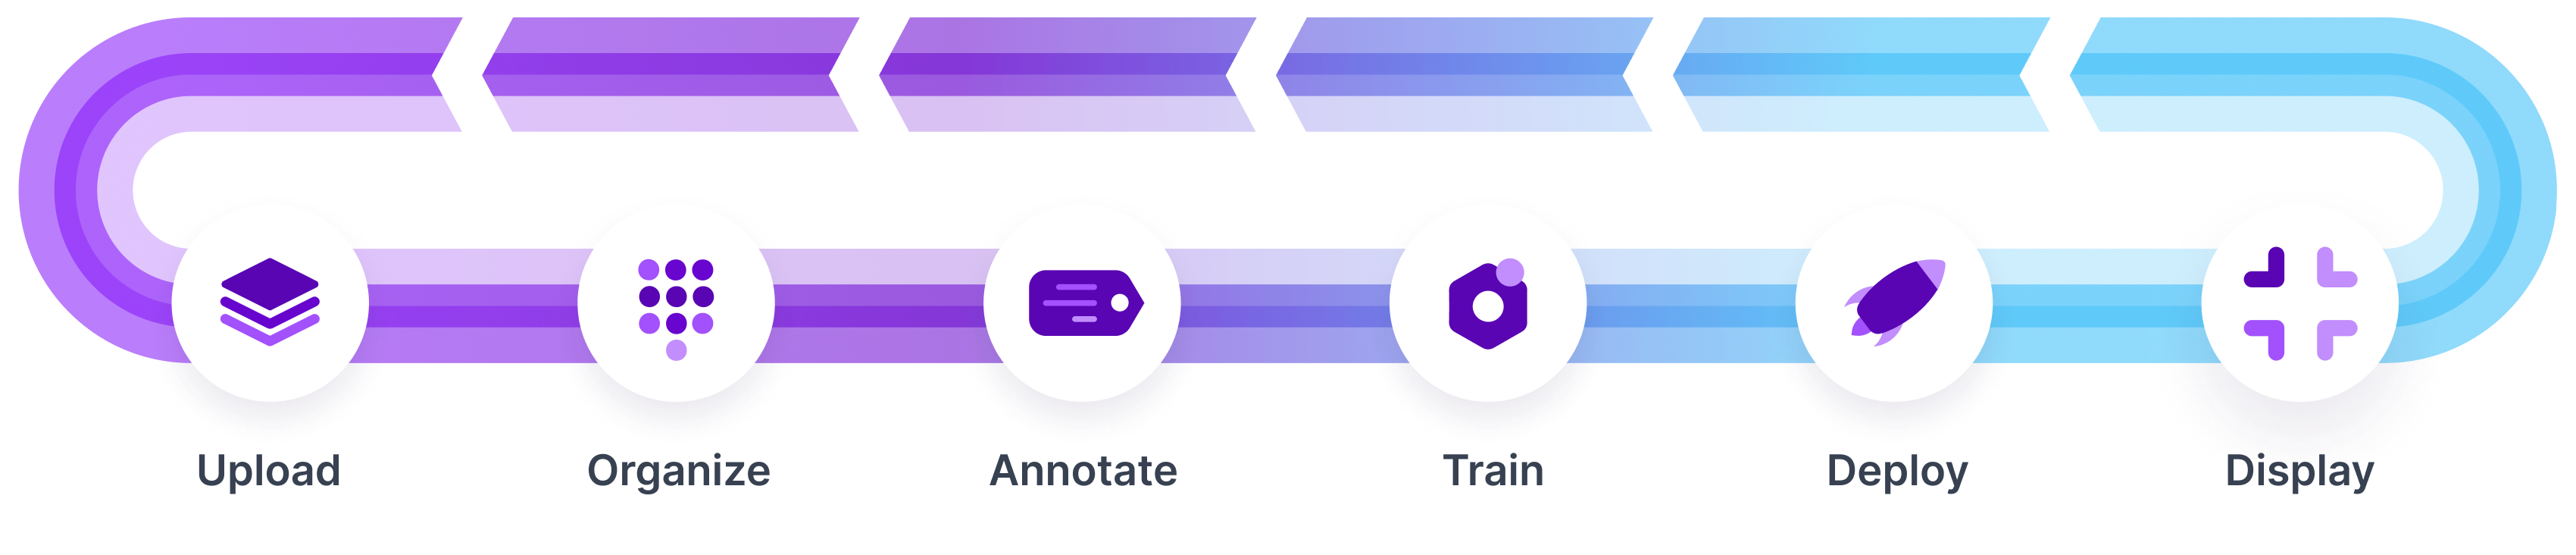 Roboflow computer vision cycle